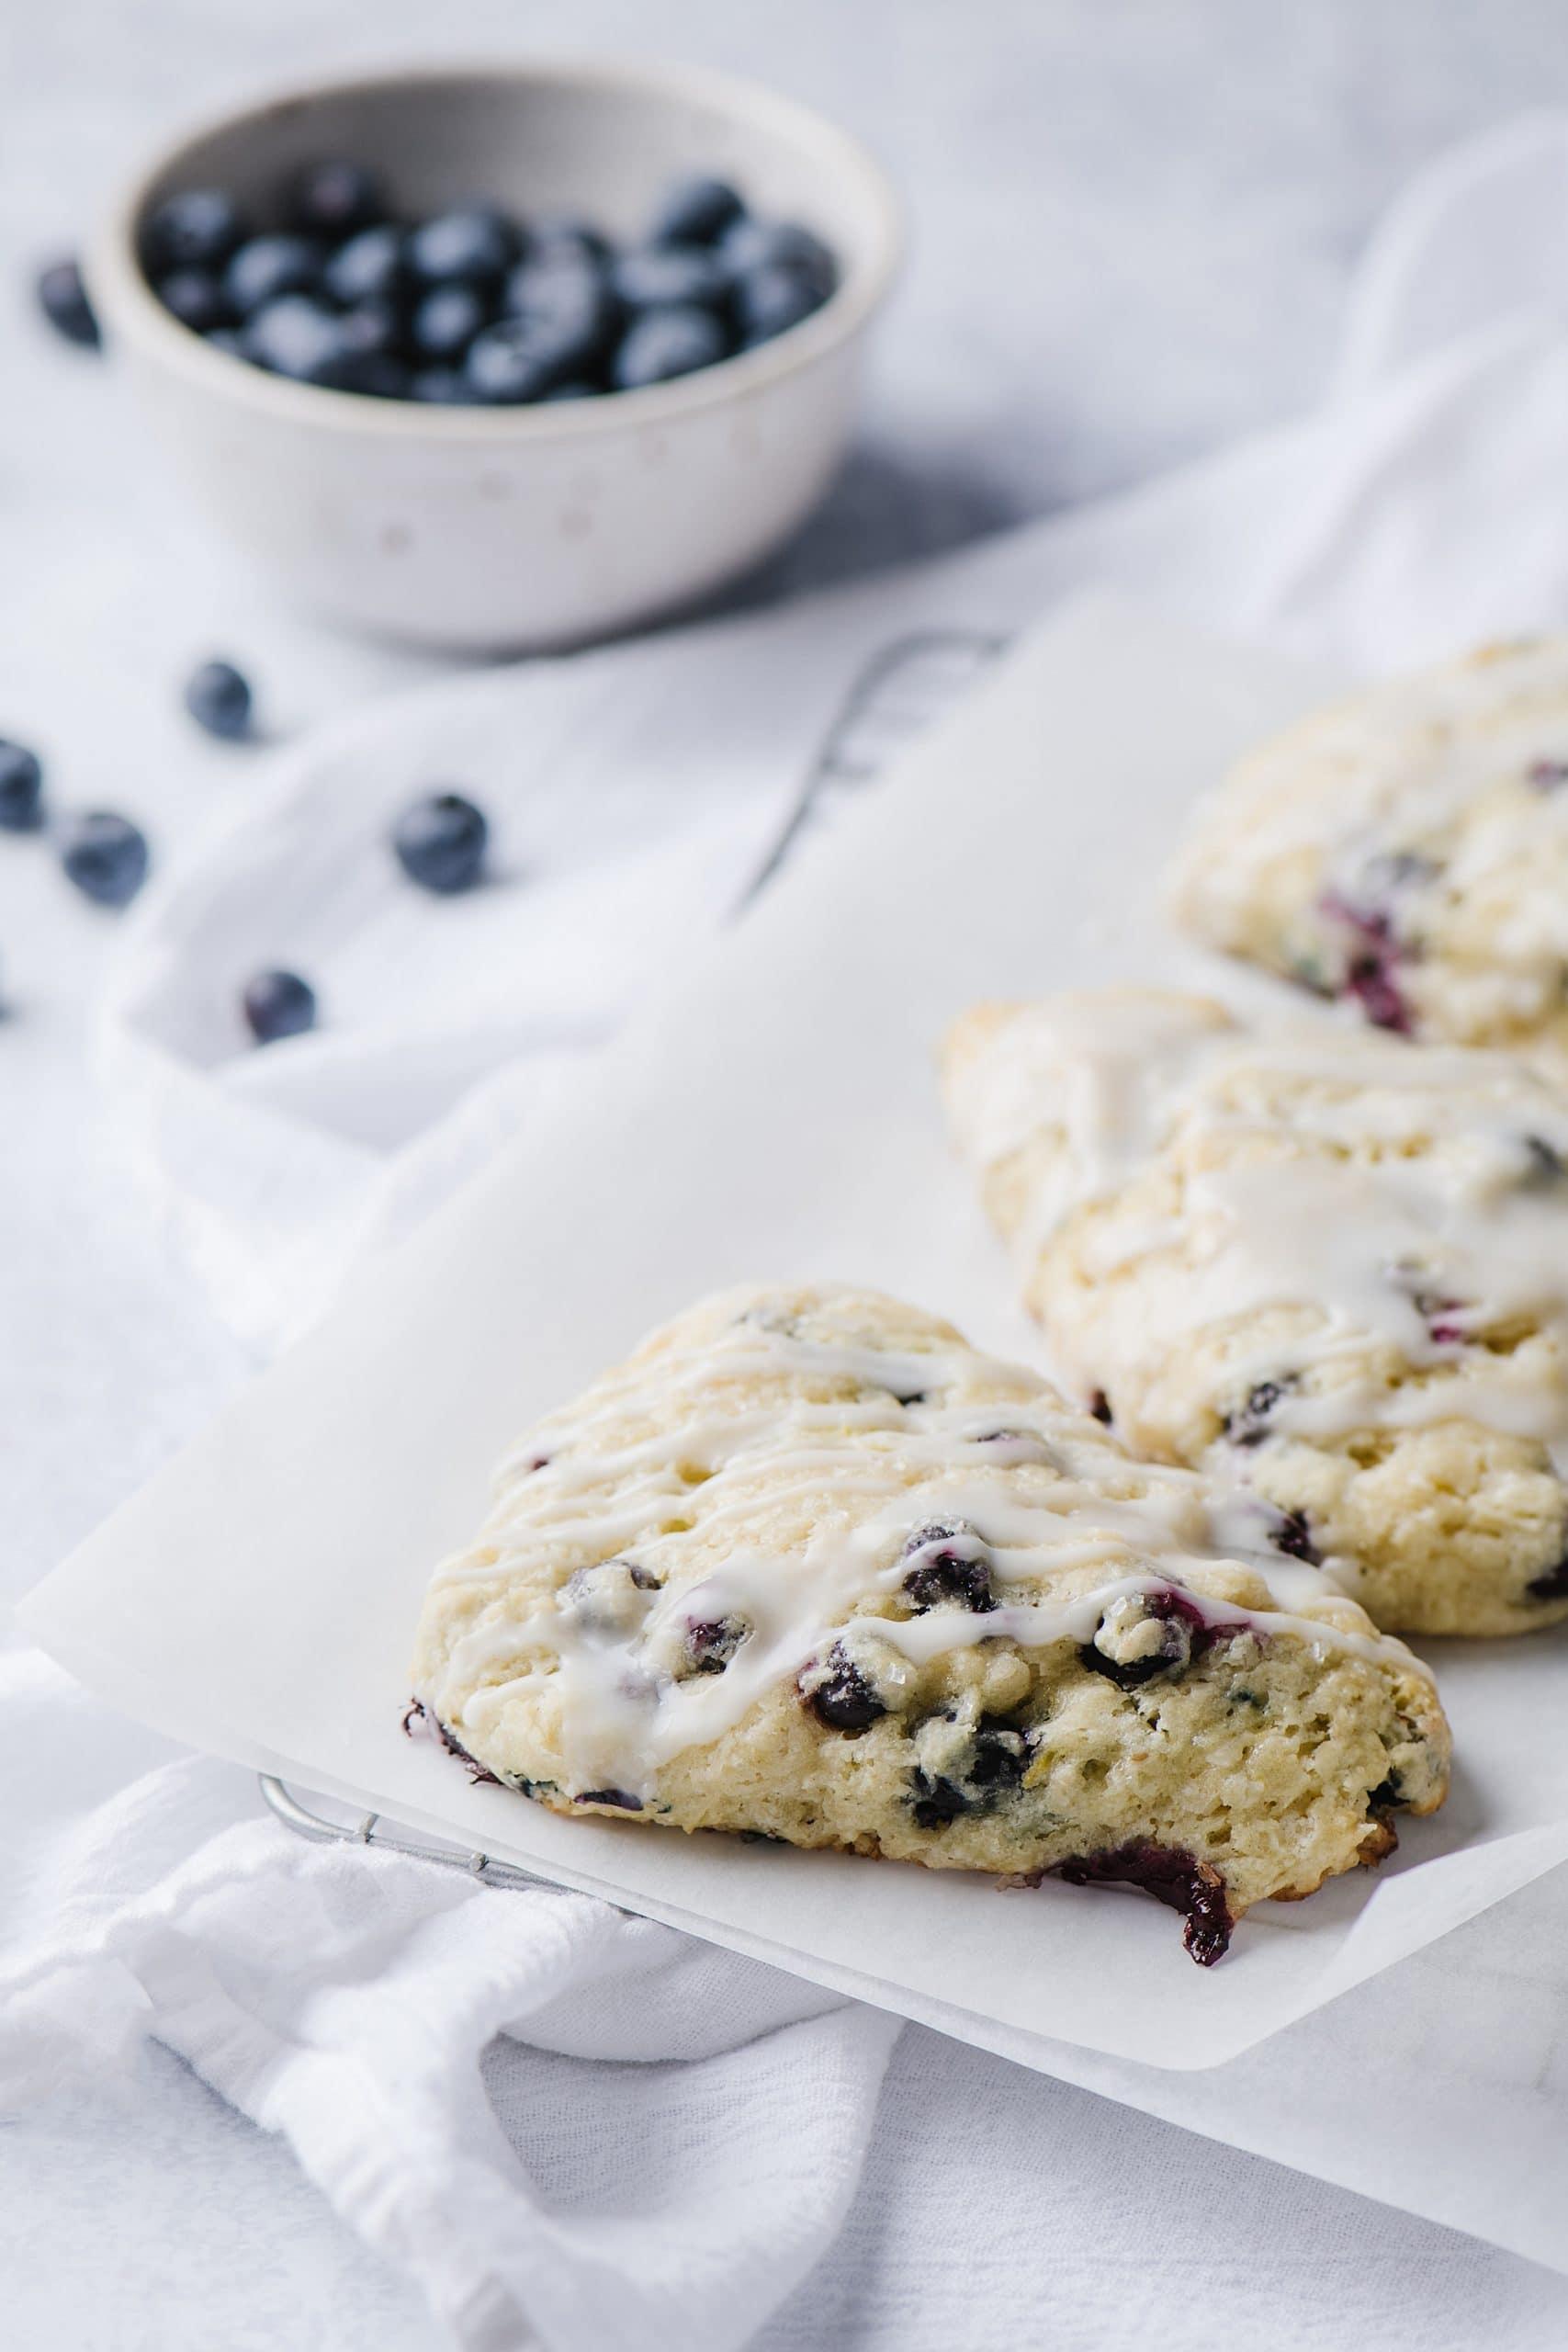 blueberry lemon scones on white plate with fresh blueberries in white bowl